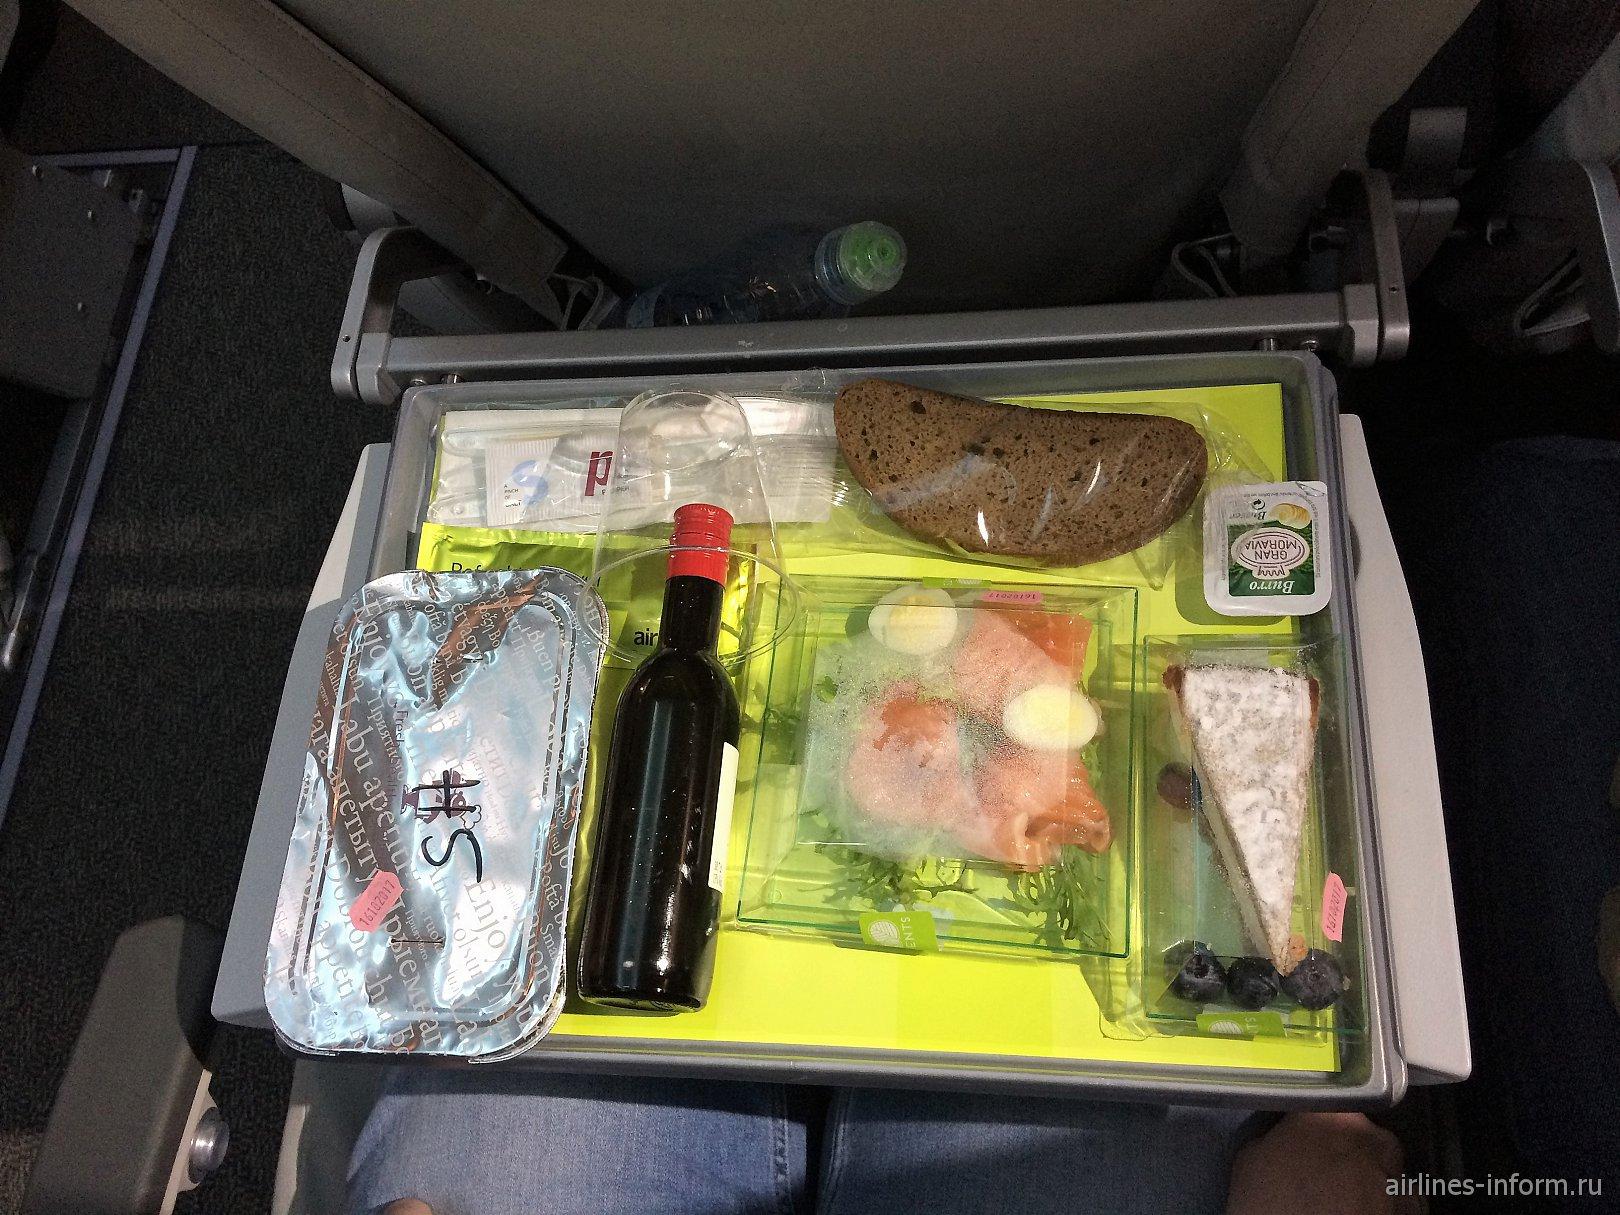 Ужин на рейсе авиакомпании airBaltic